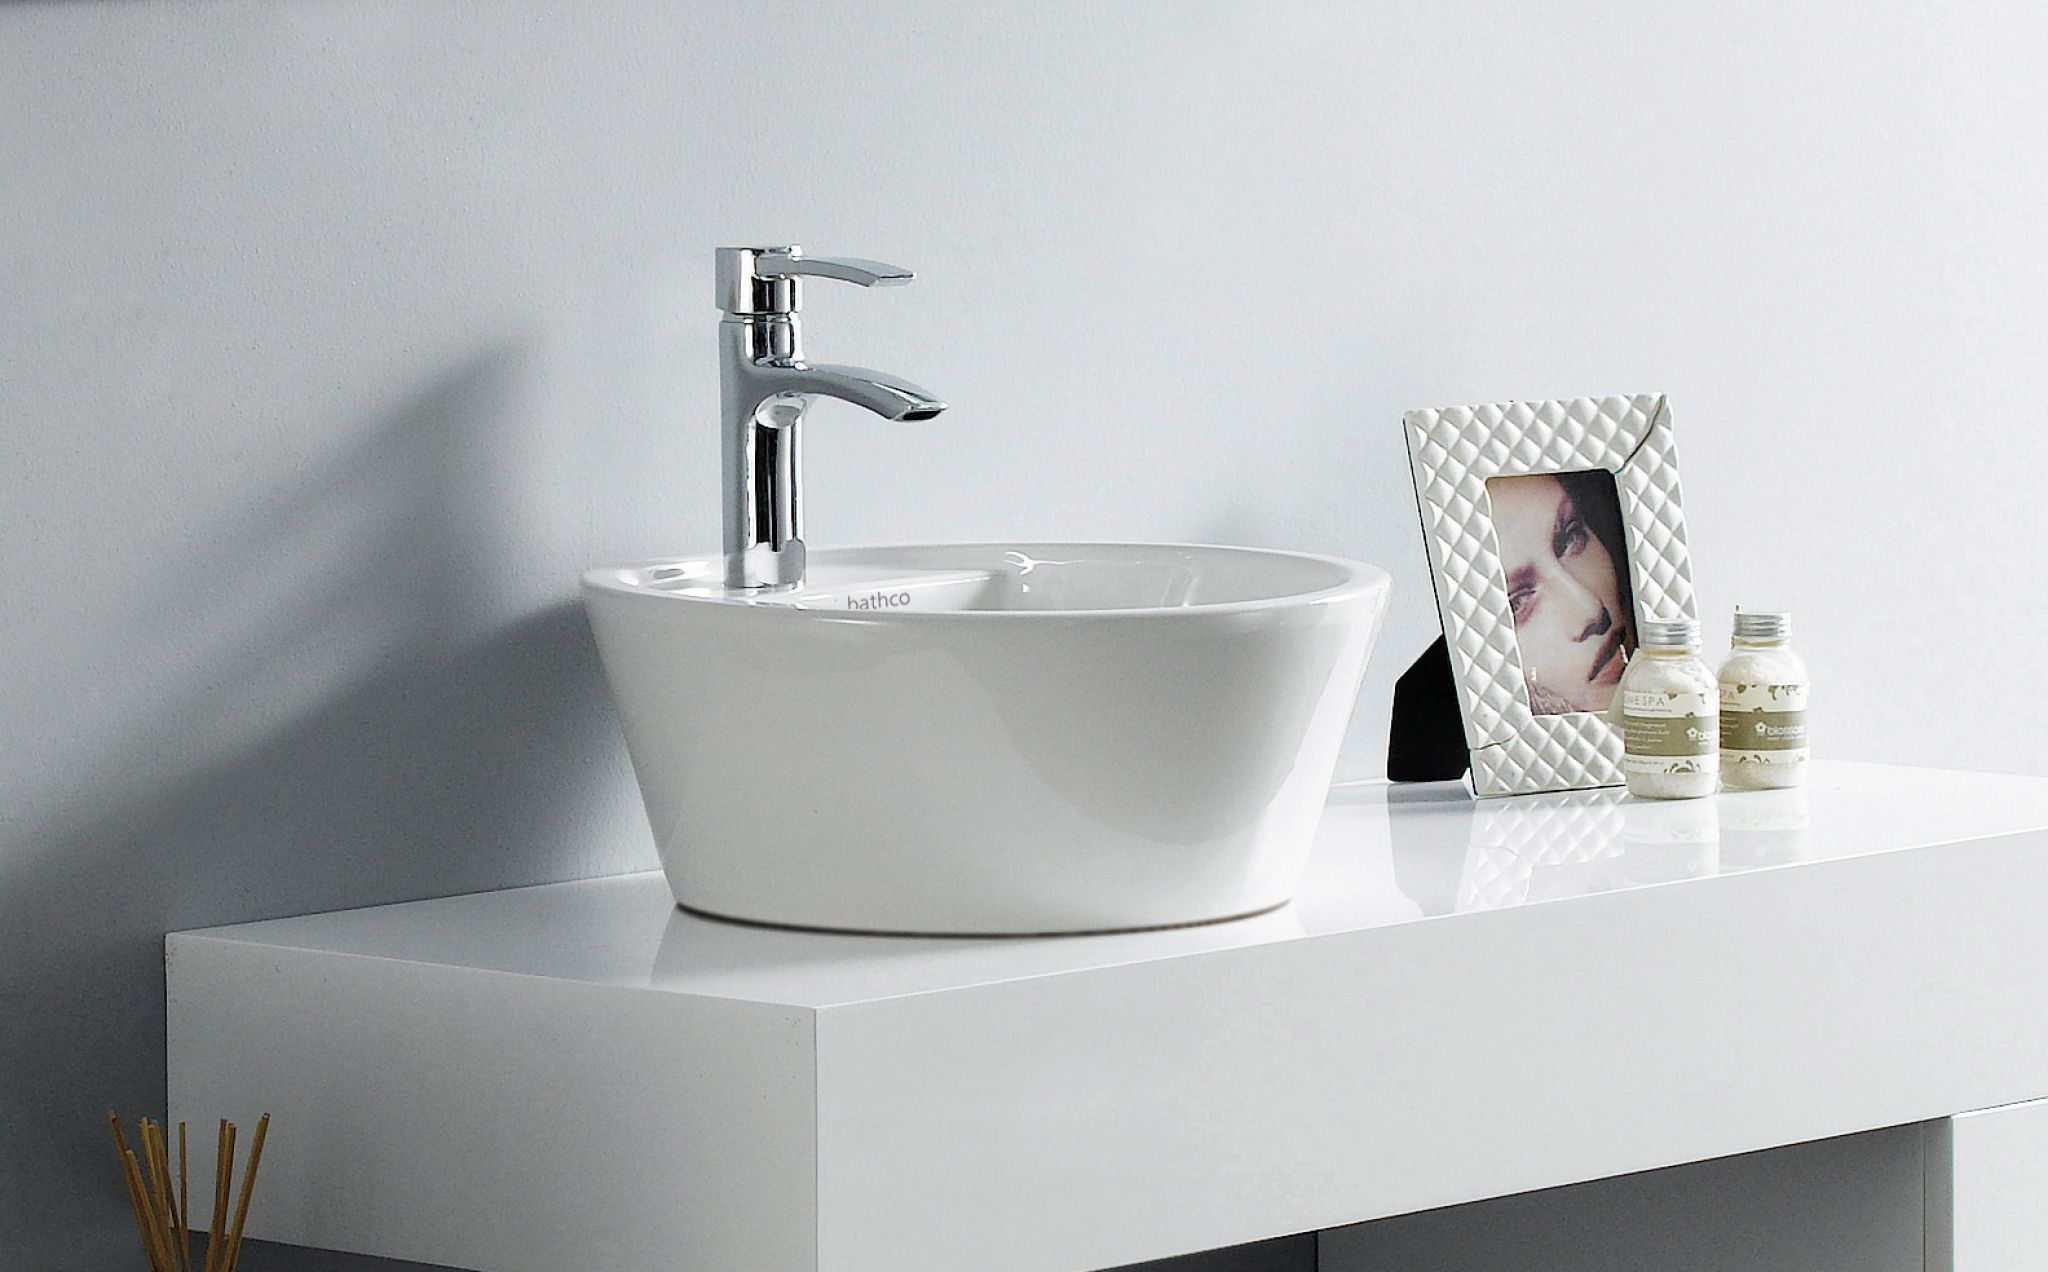 lavabo florencia a circular de porcelana sobre encimera con